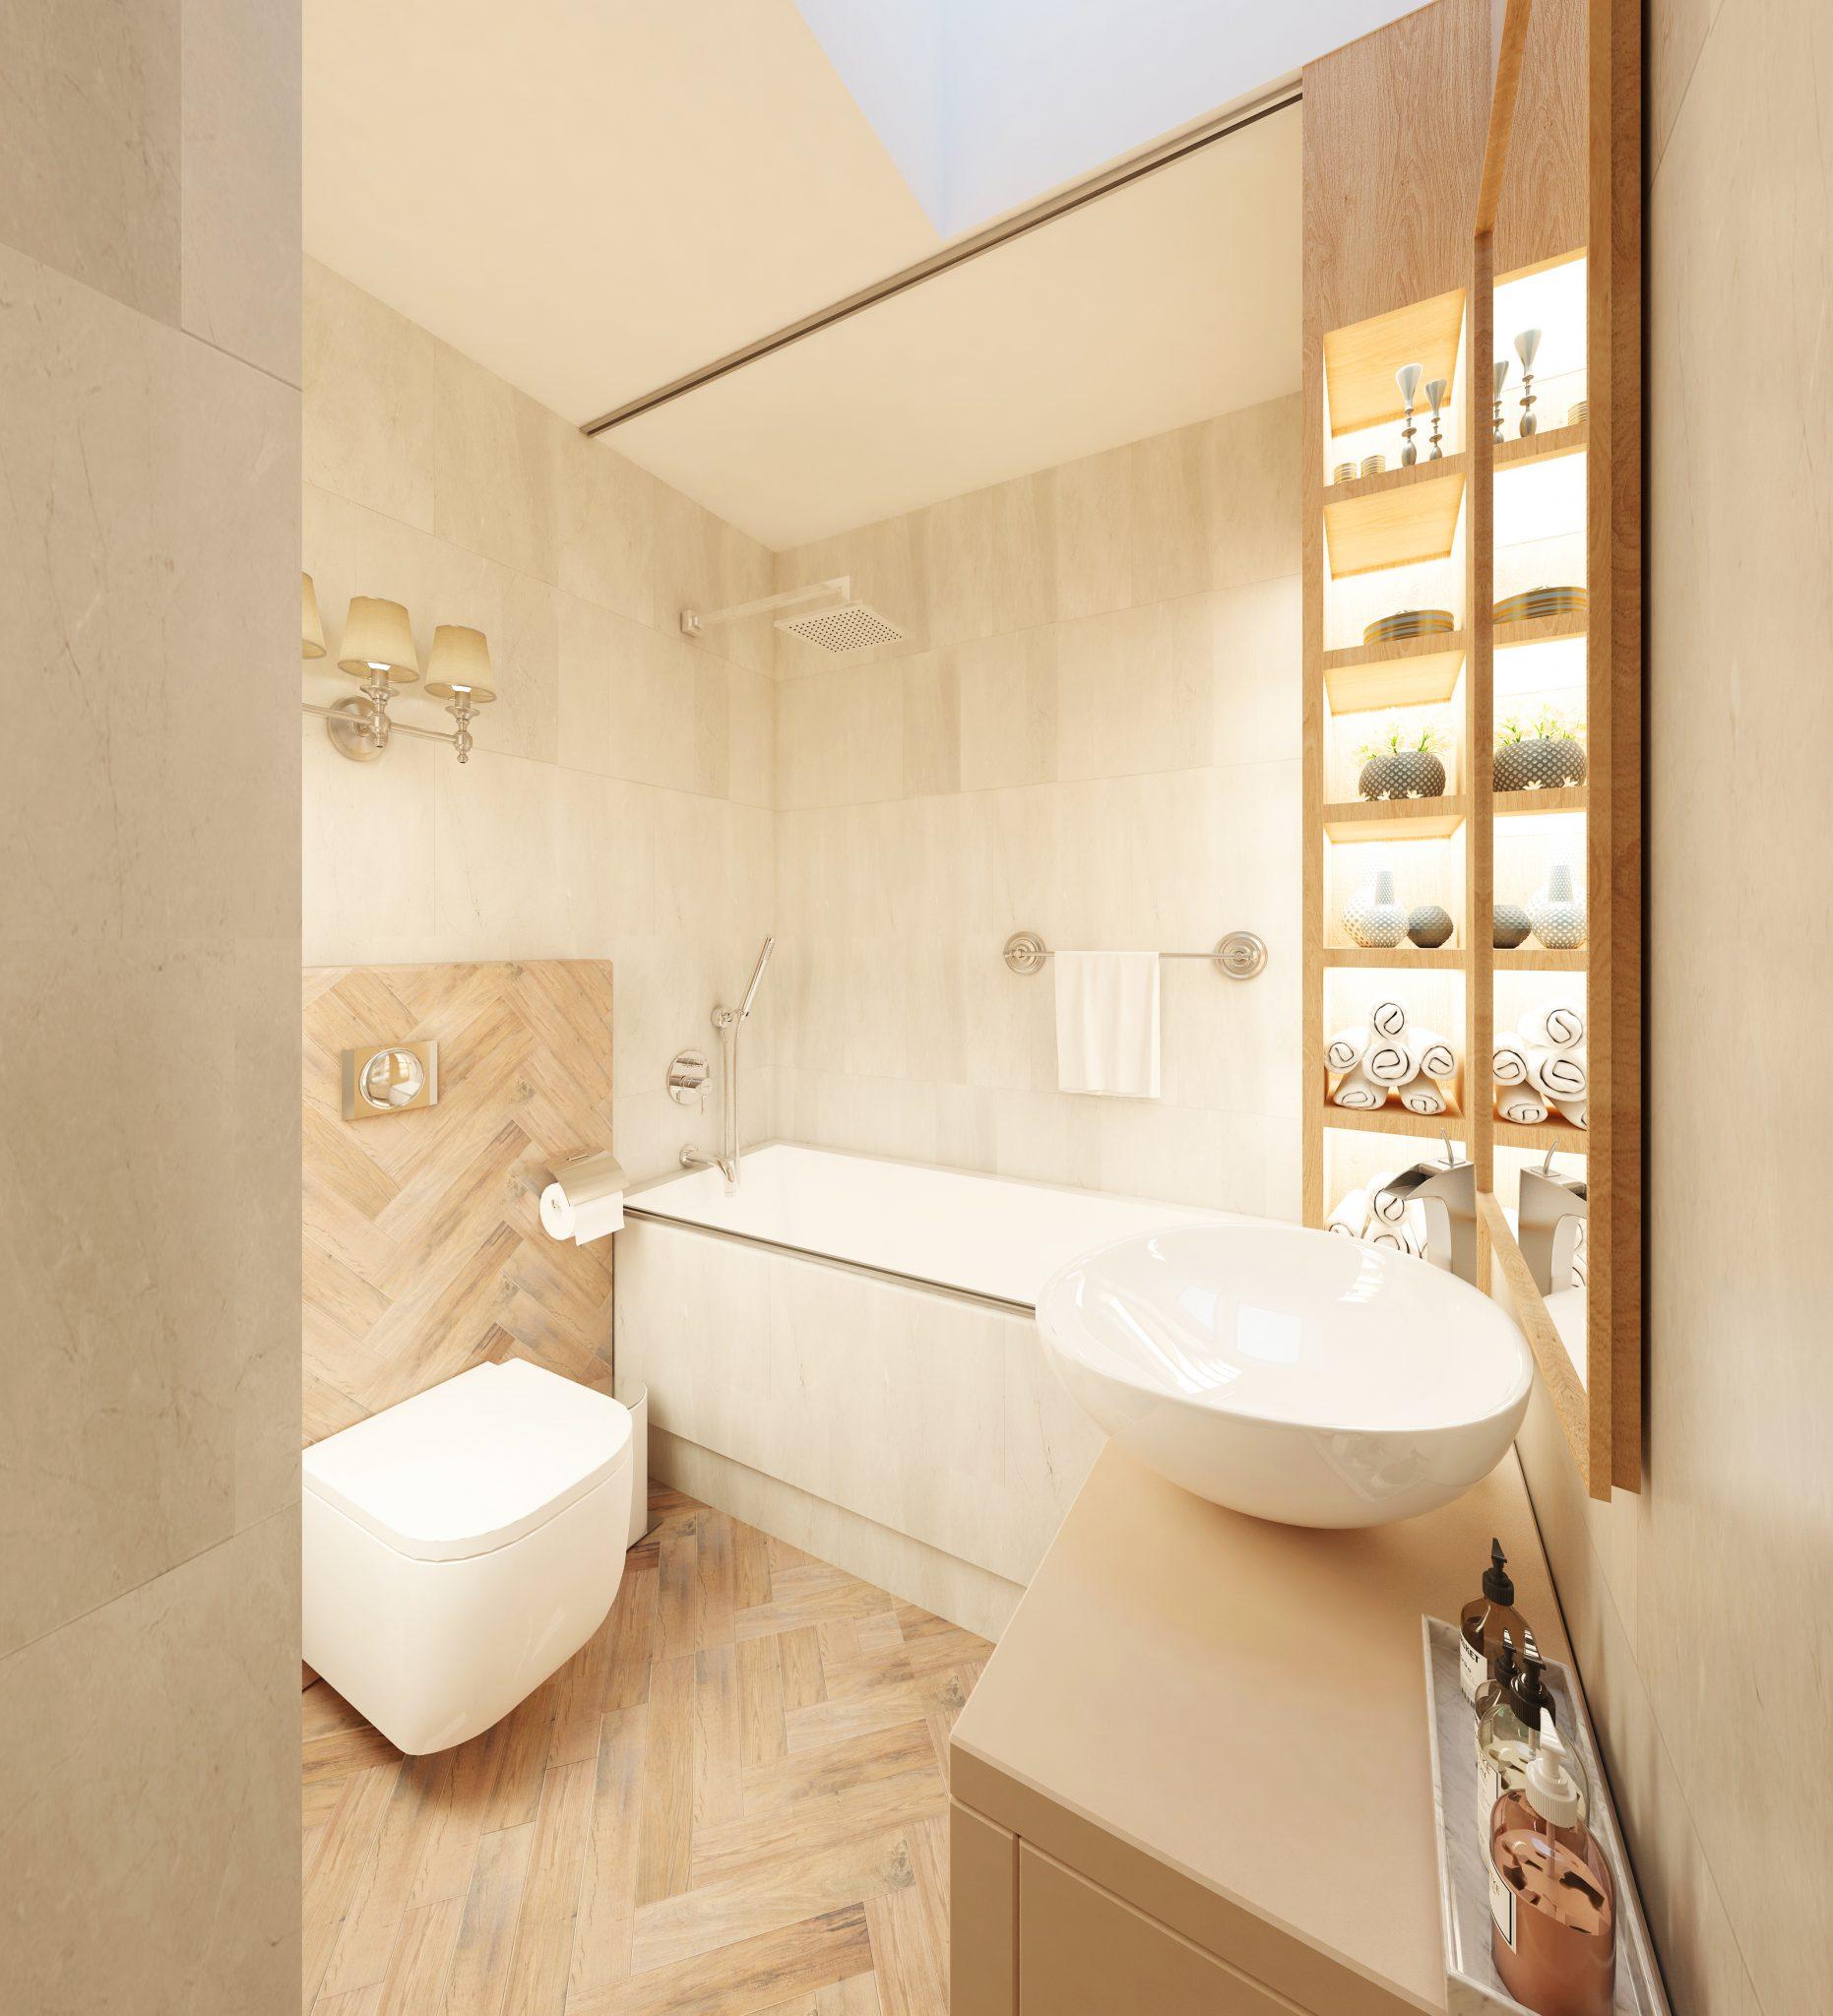 466-Bathroom Visualisation v2